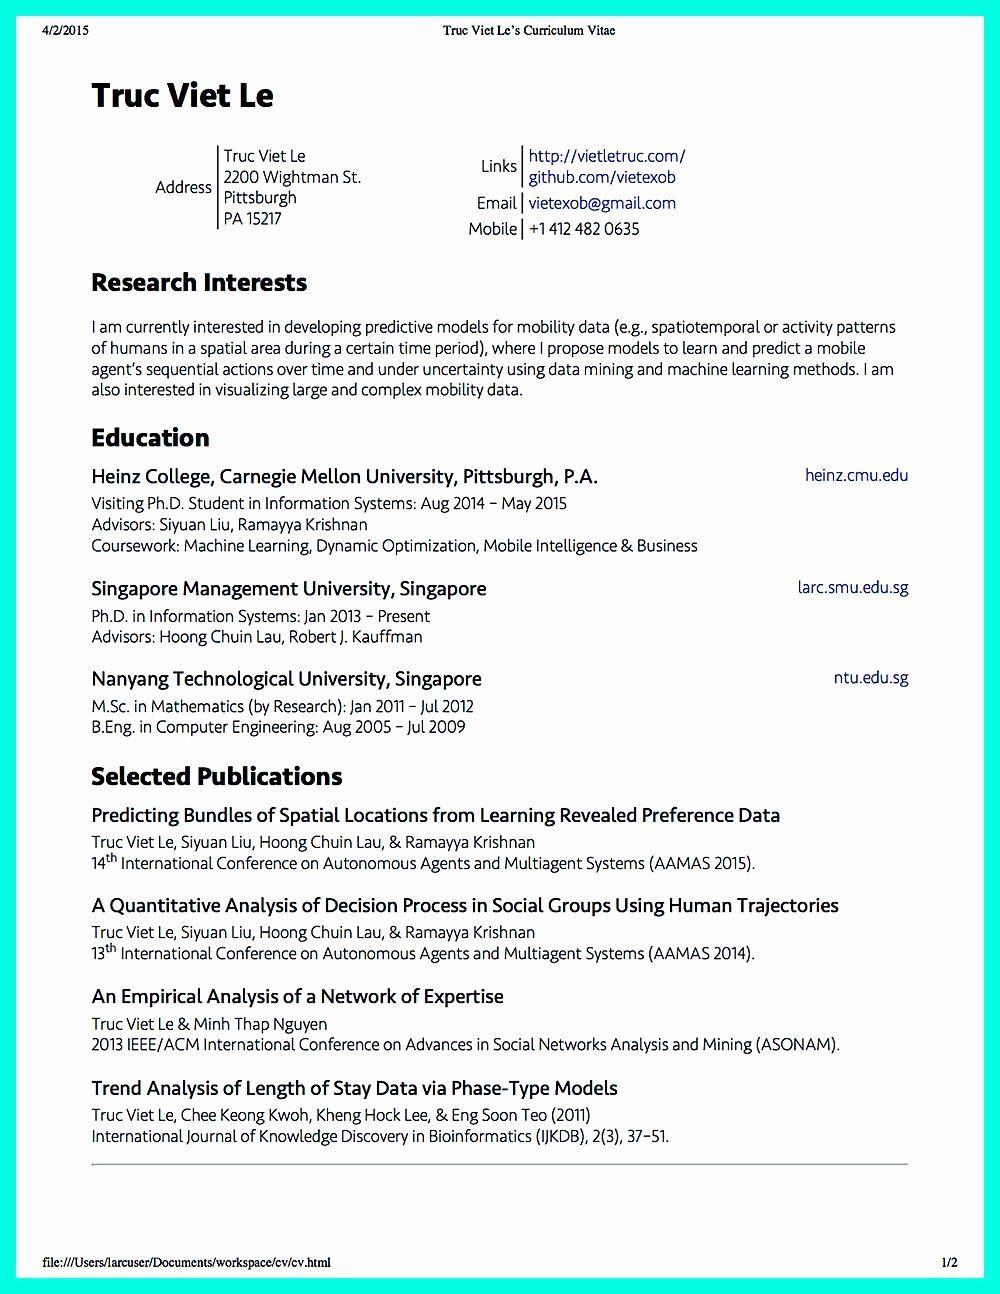 23 Data Scientist Resume Example in 2020 Resume examples